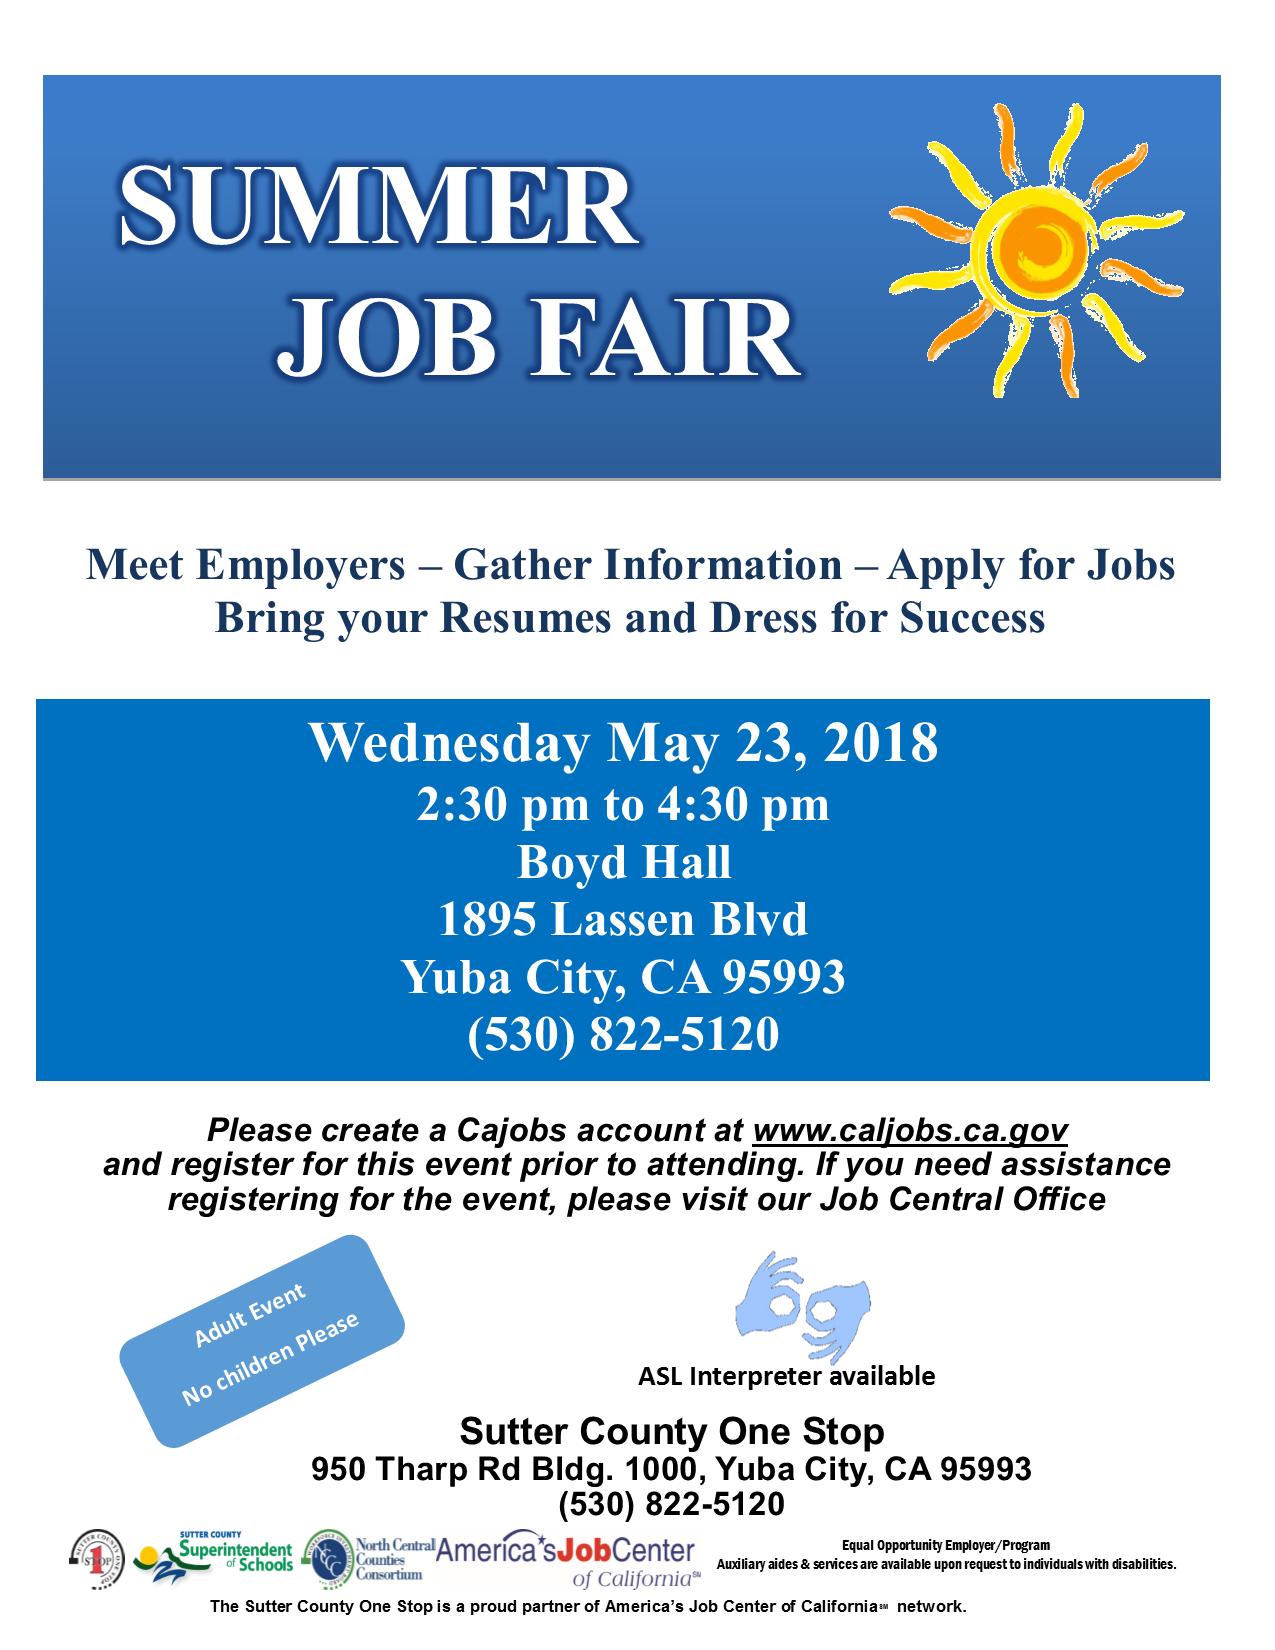 Yuba City Job Fair